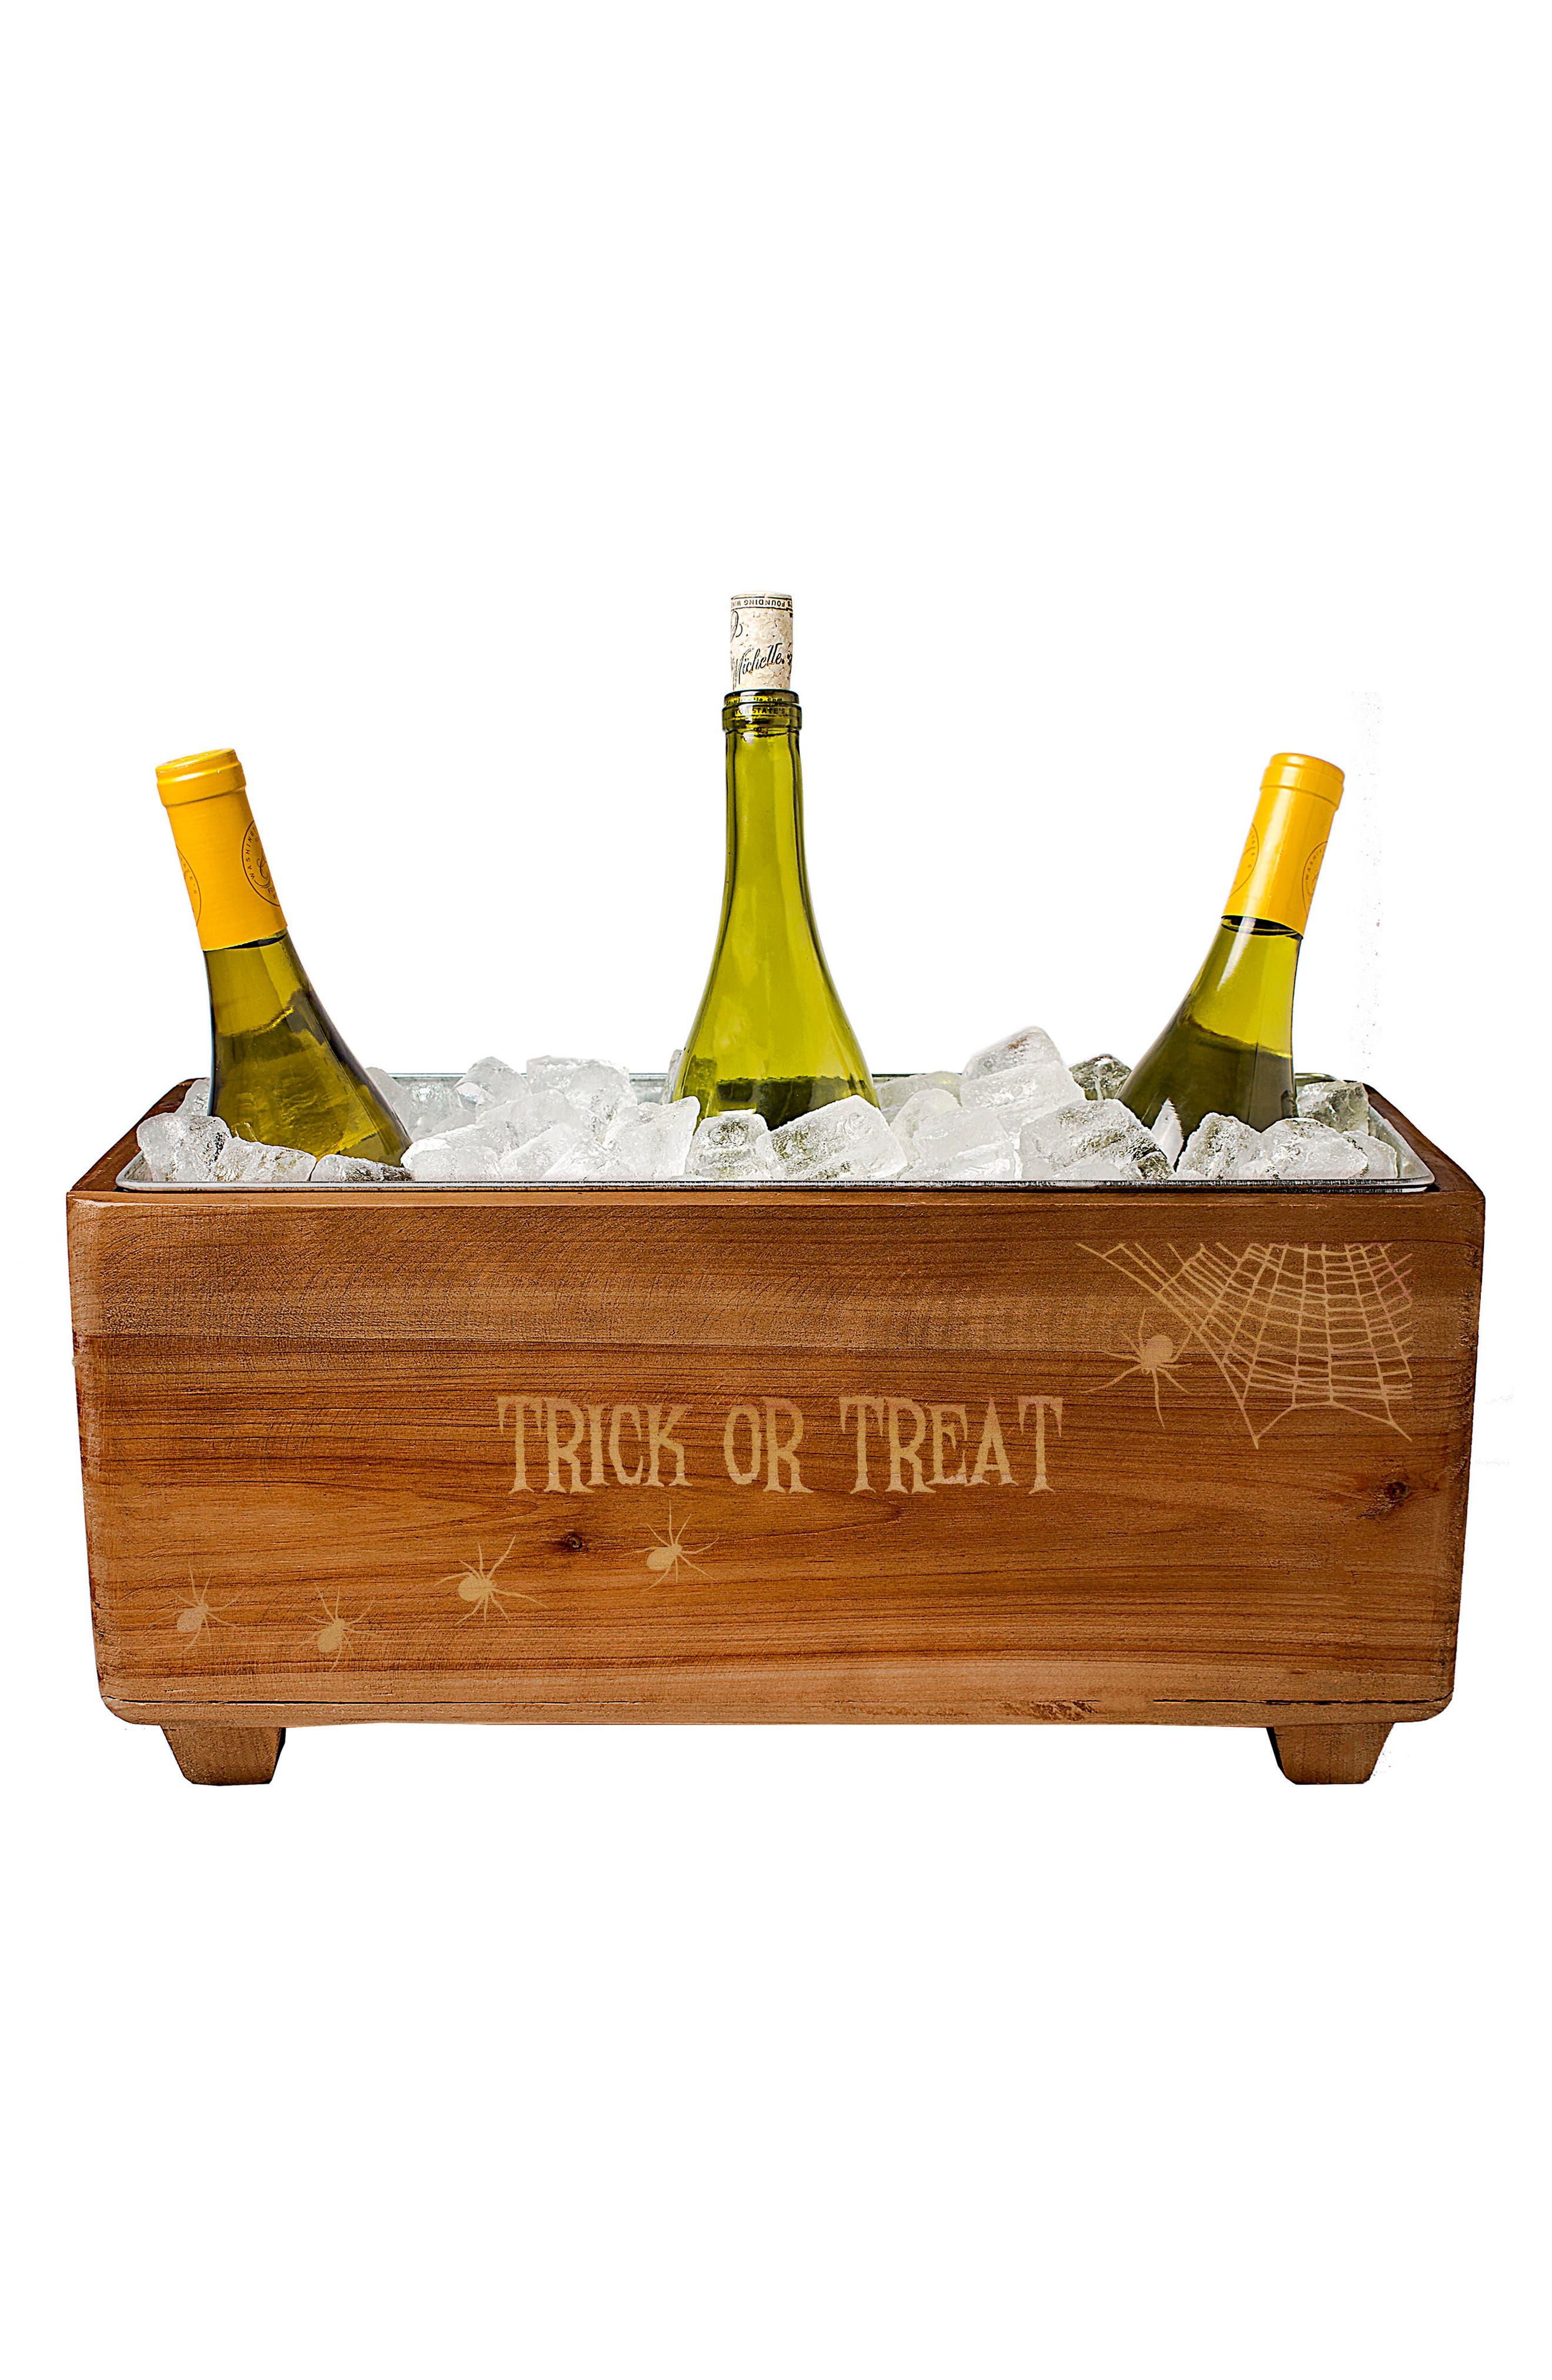 Trick or Treat Wood Wine Trough,                             Alternate thumbnail 3, color,                             200